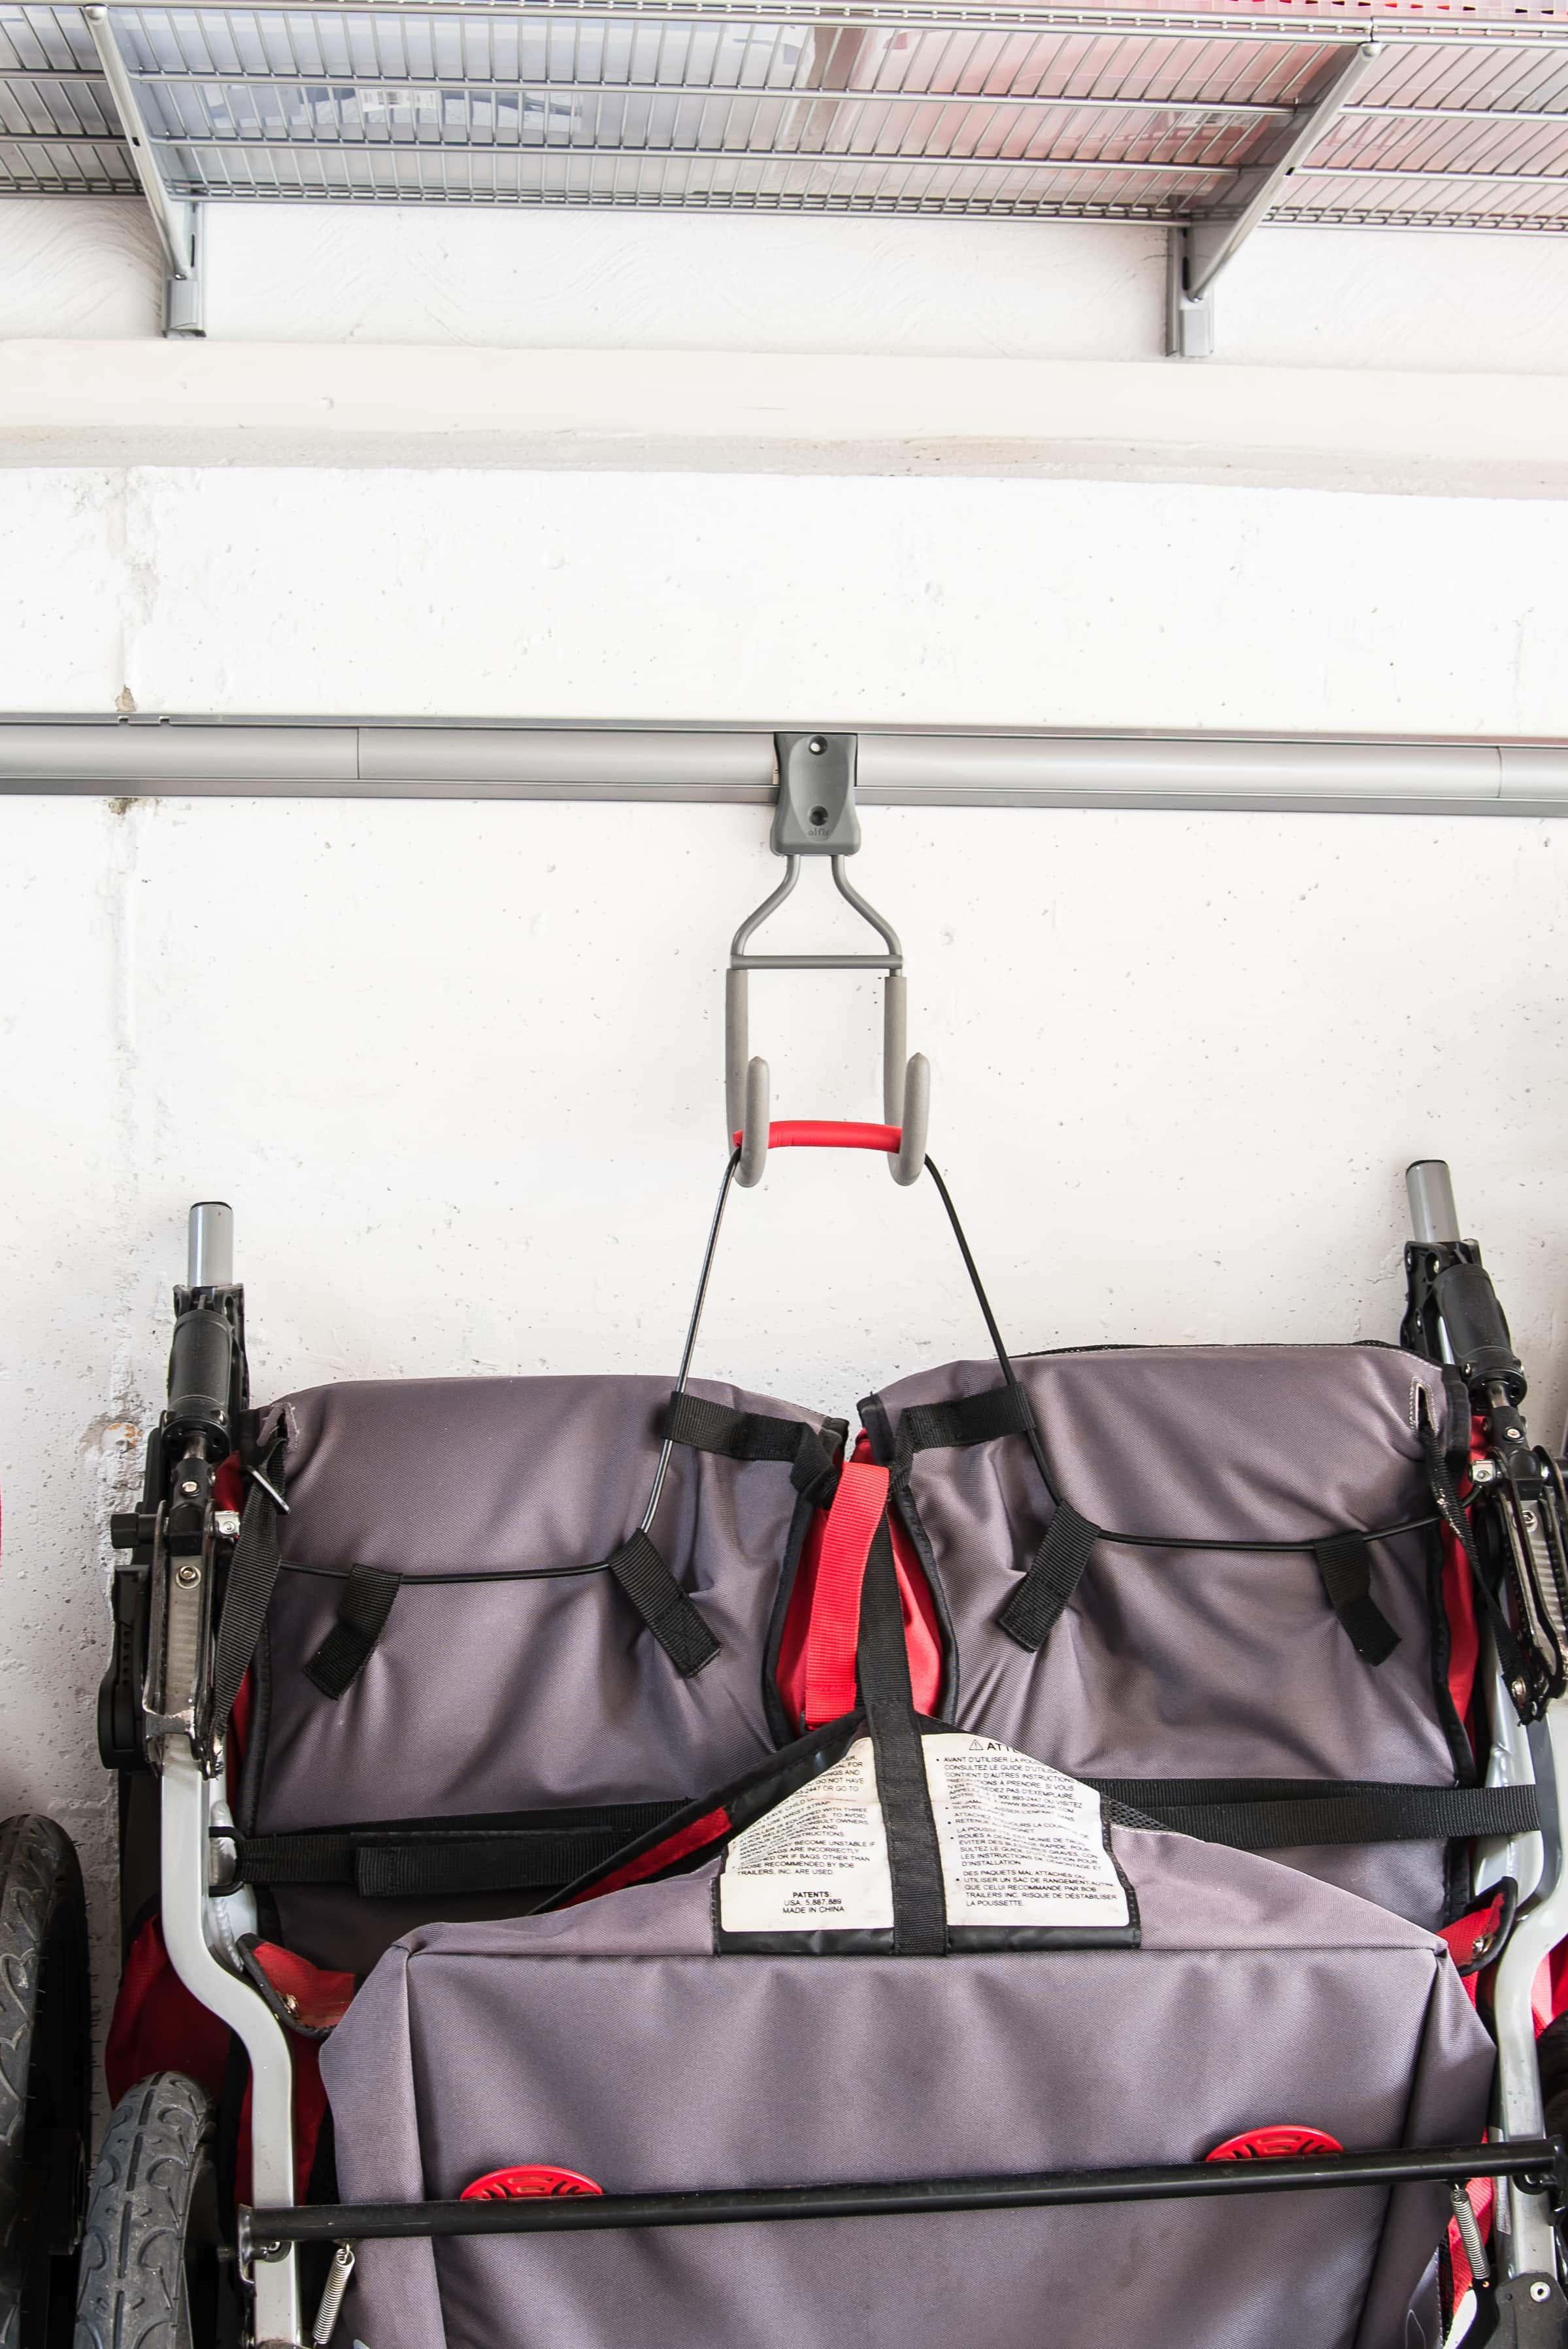 Hooks for hanging strollers in garage